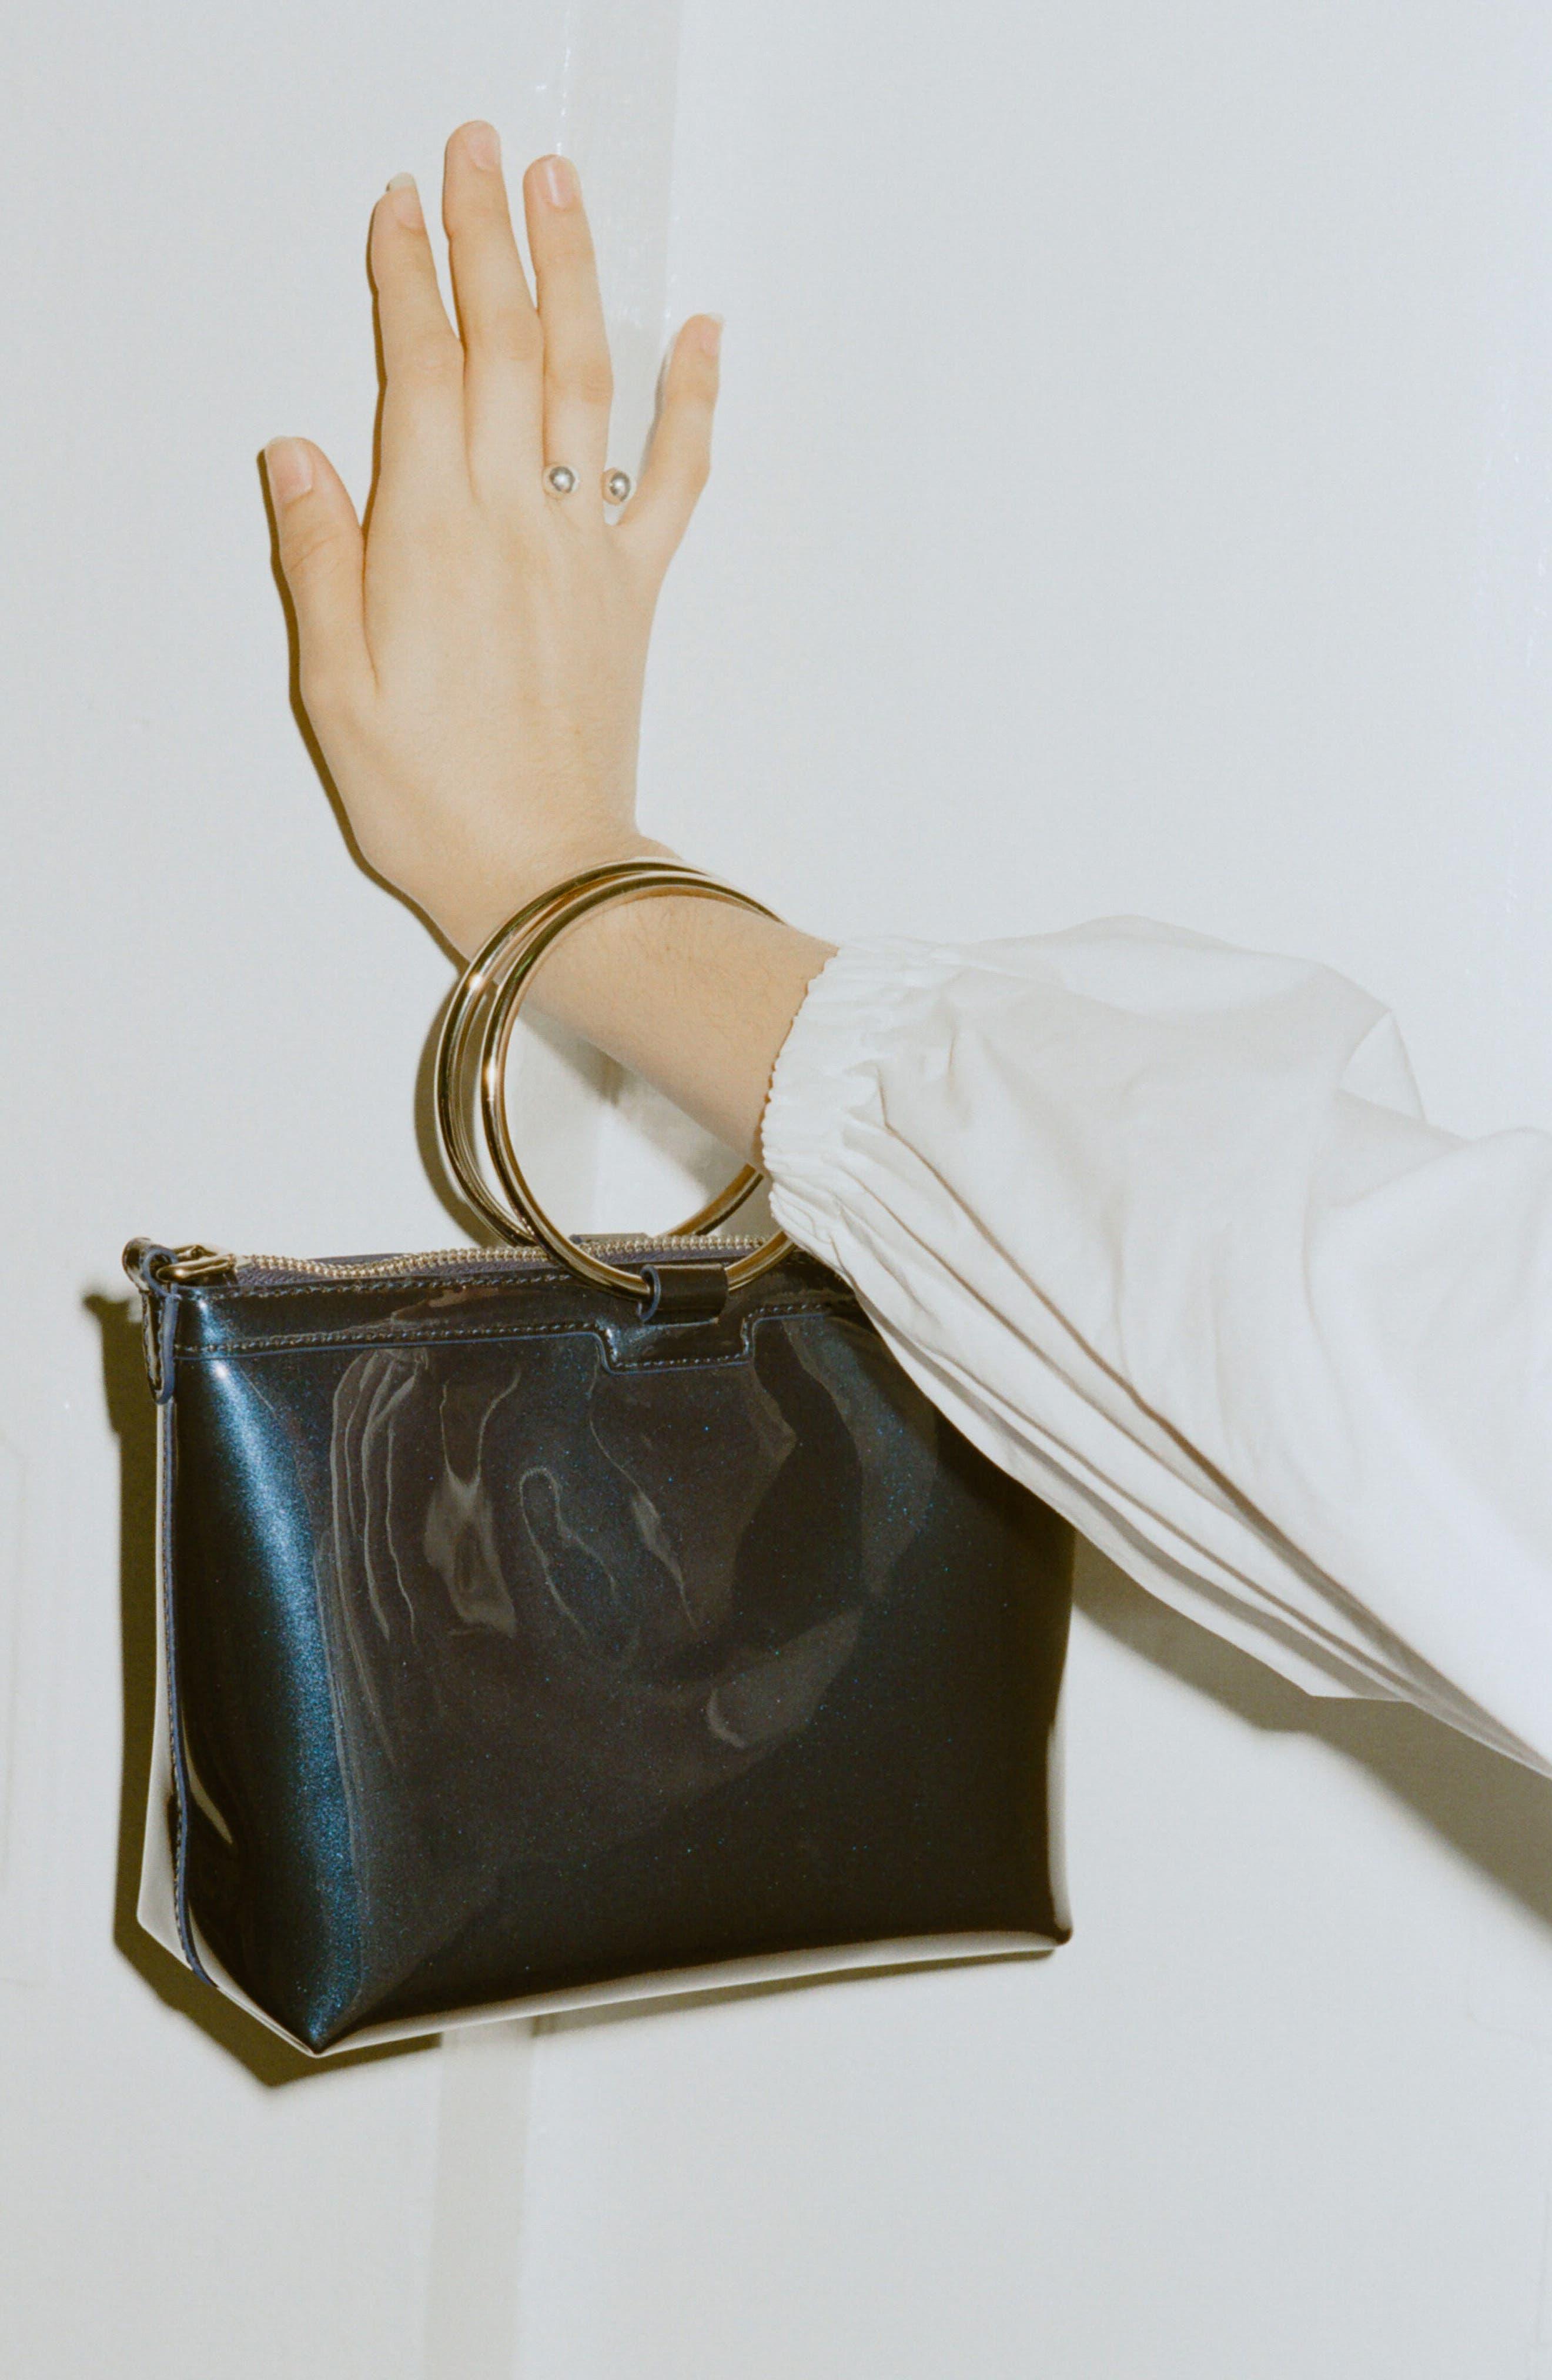 Iridescent Ring Crossbody Bag,                             Alternate thumbnail 9, color,                             Galaxy Navy